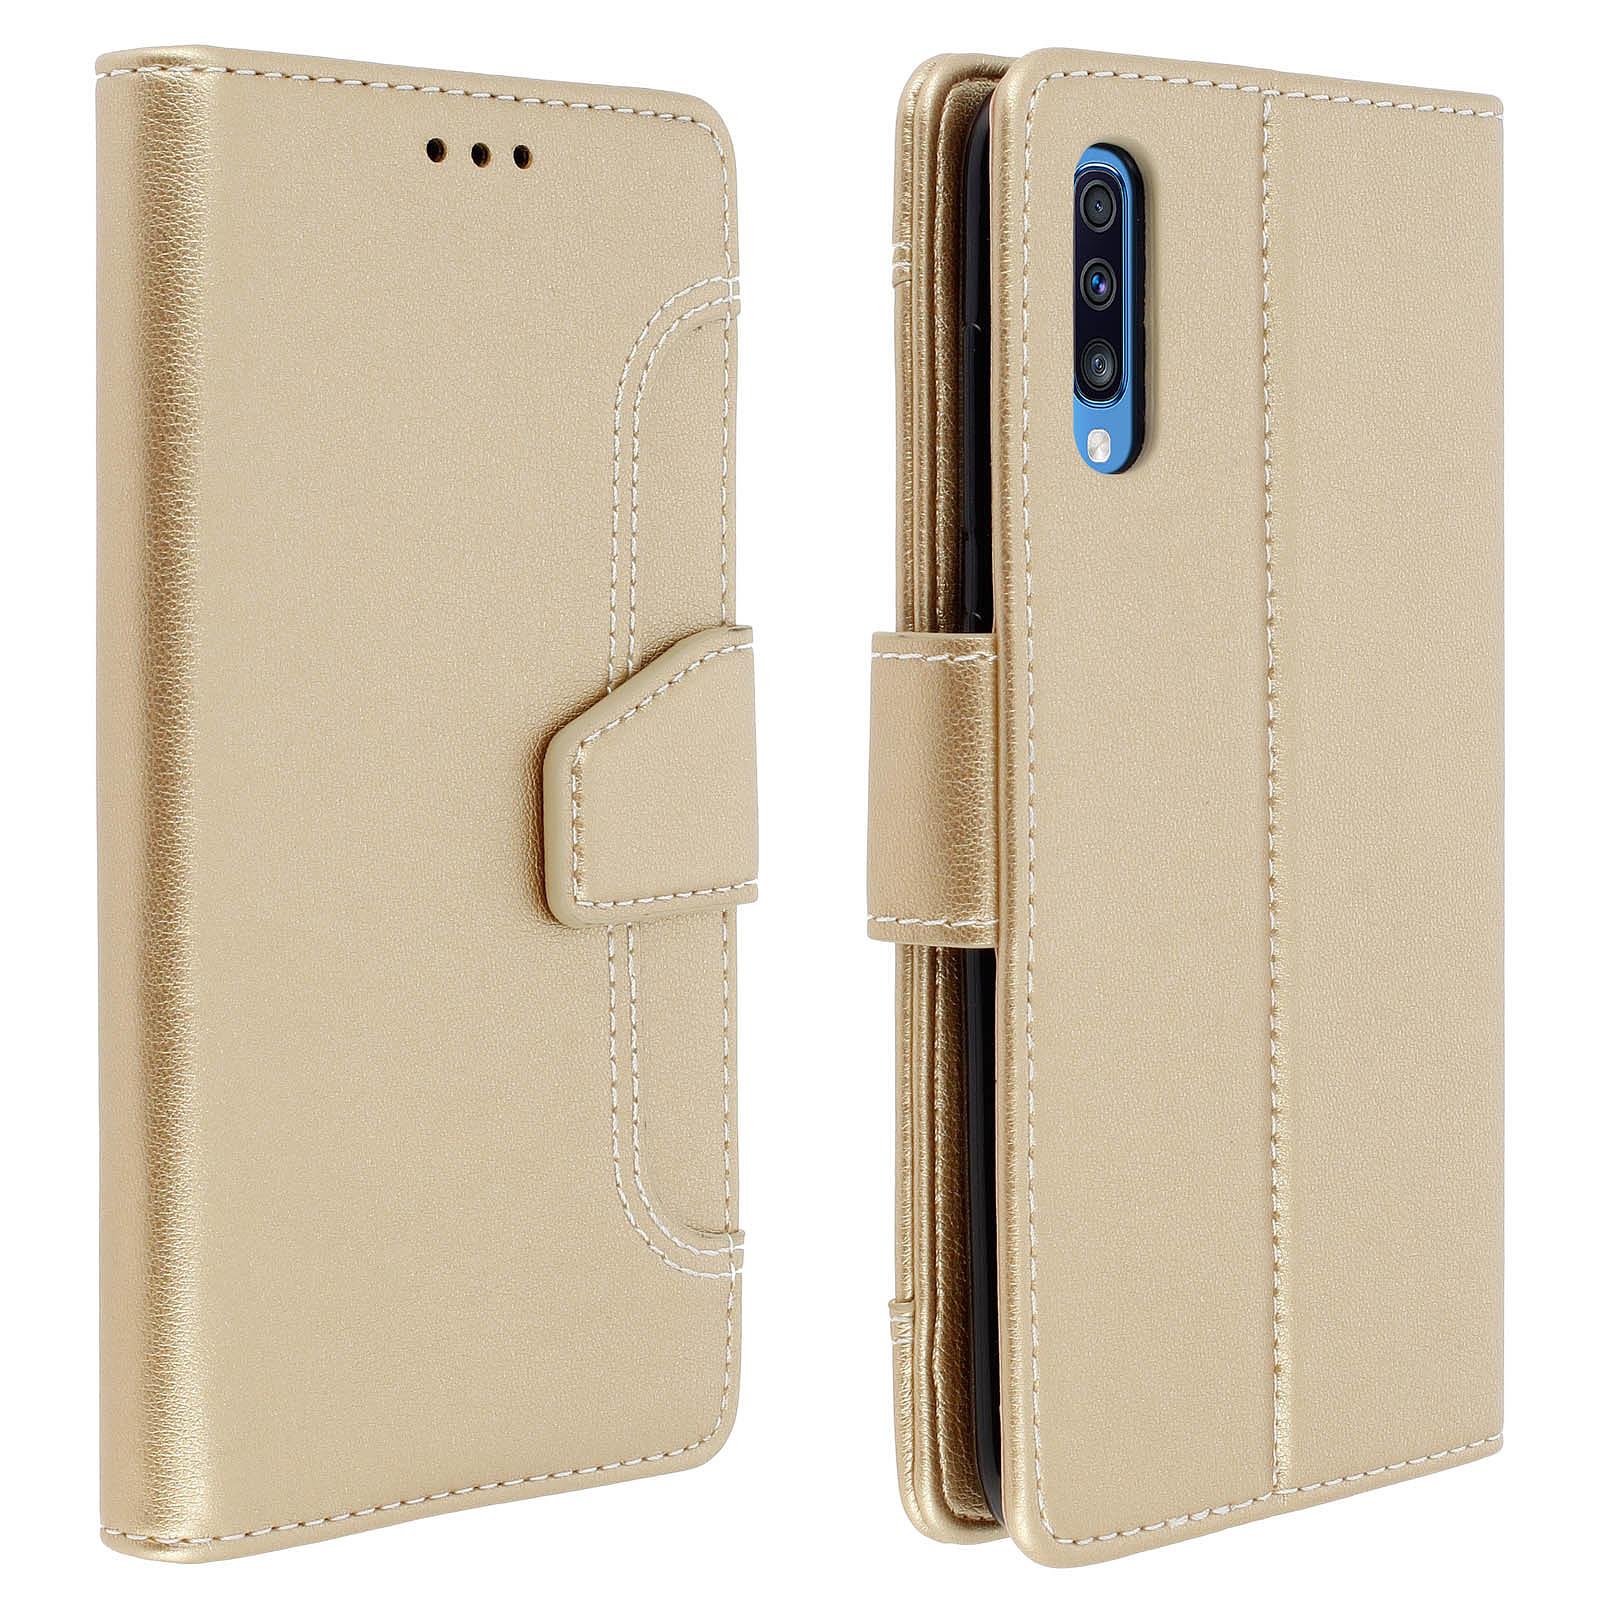 Avizar Etui folio Dorée pour Samsung Galaxy A50 , Samsung Galaxy A30s